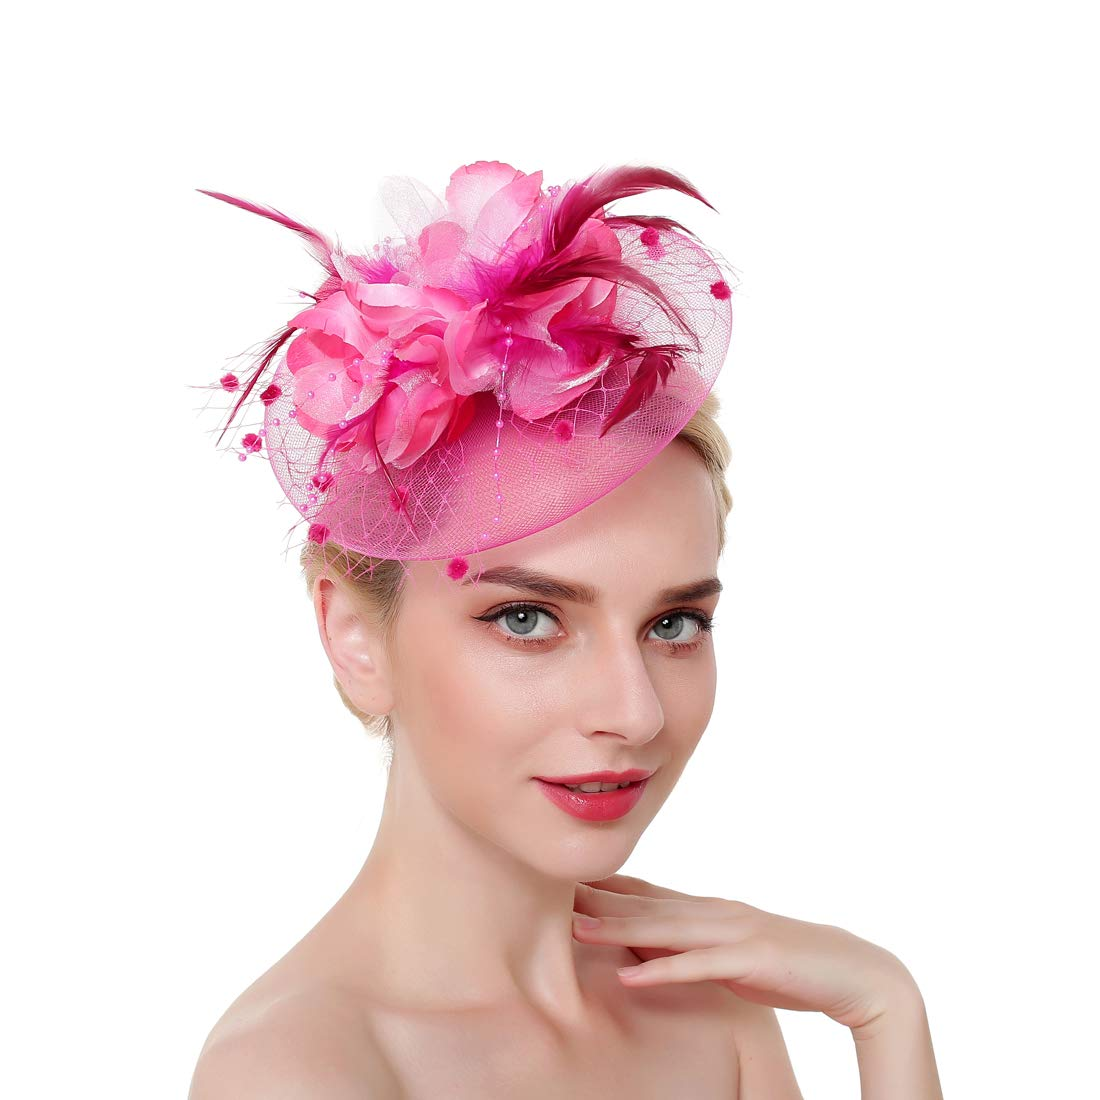 dressfan Elegant Circular Mesh Net Flower Feather Fascinator Hair Clip Hat Banquet Wedding Barrettes